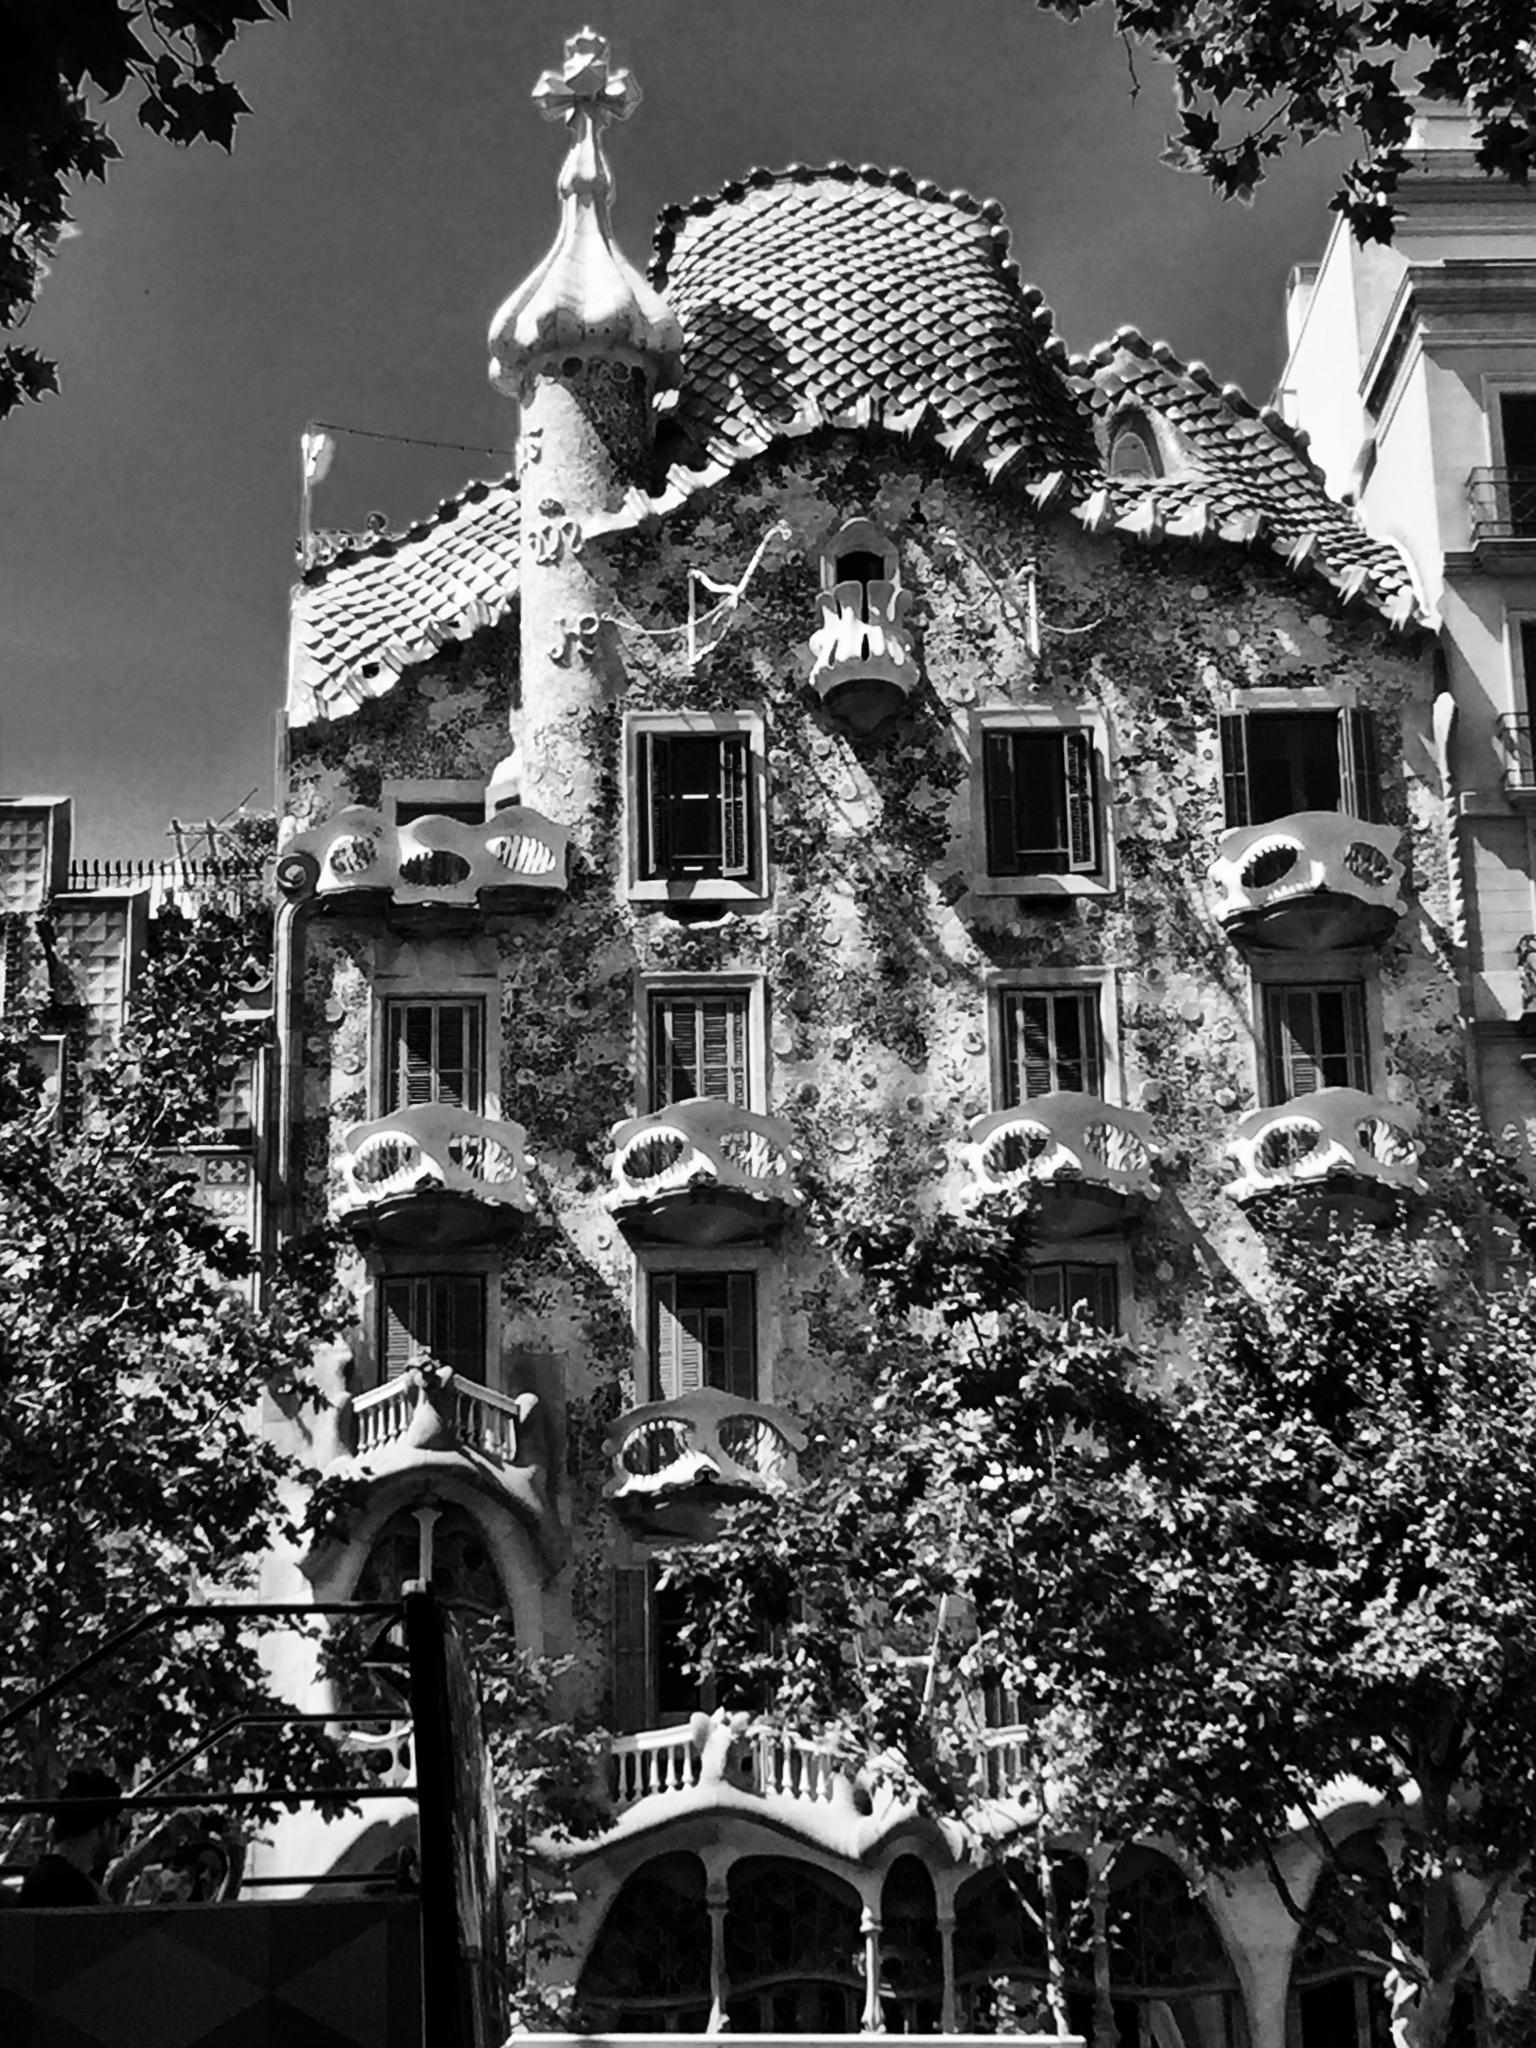 Candelaria Design Tour Spain 2019 - Barcelona